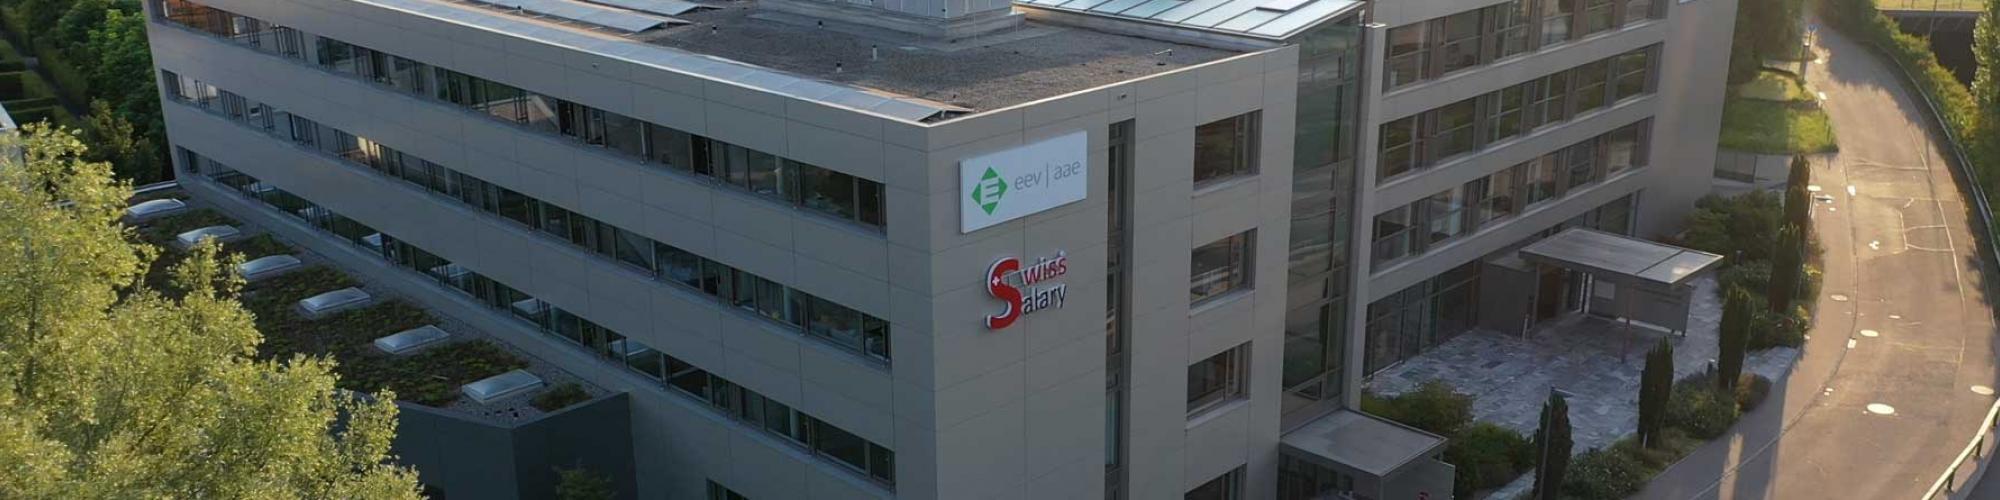 SwissSalary Ltd.